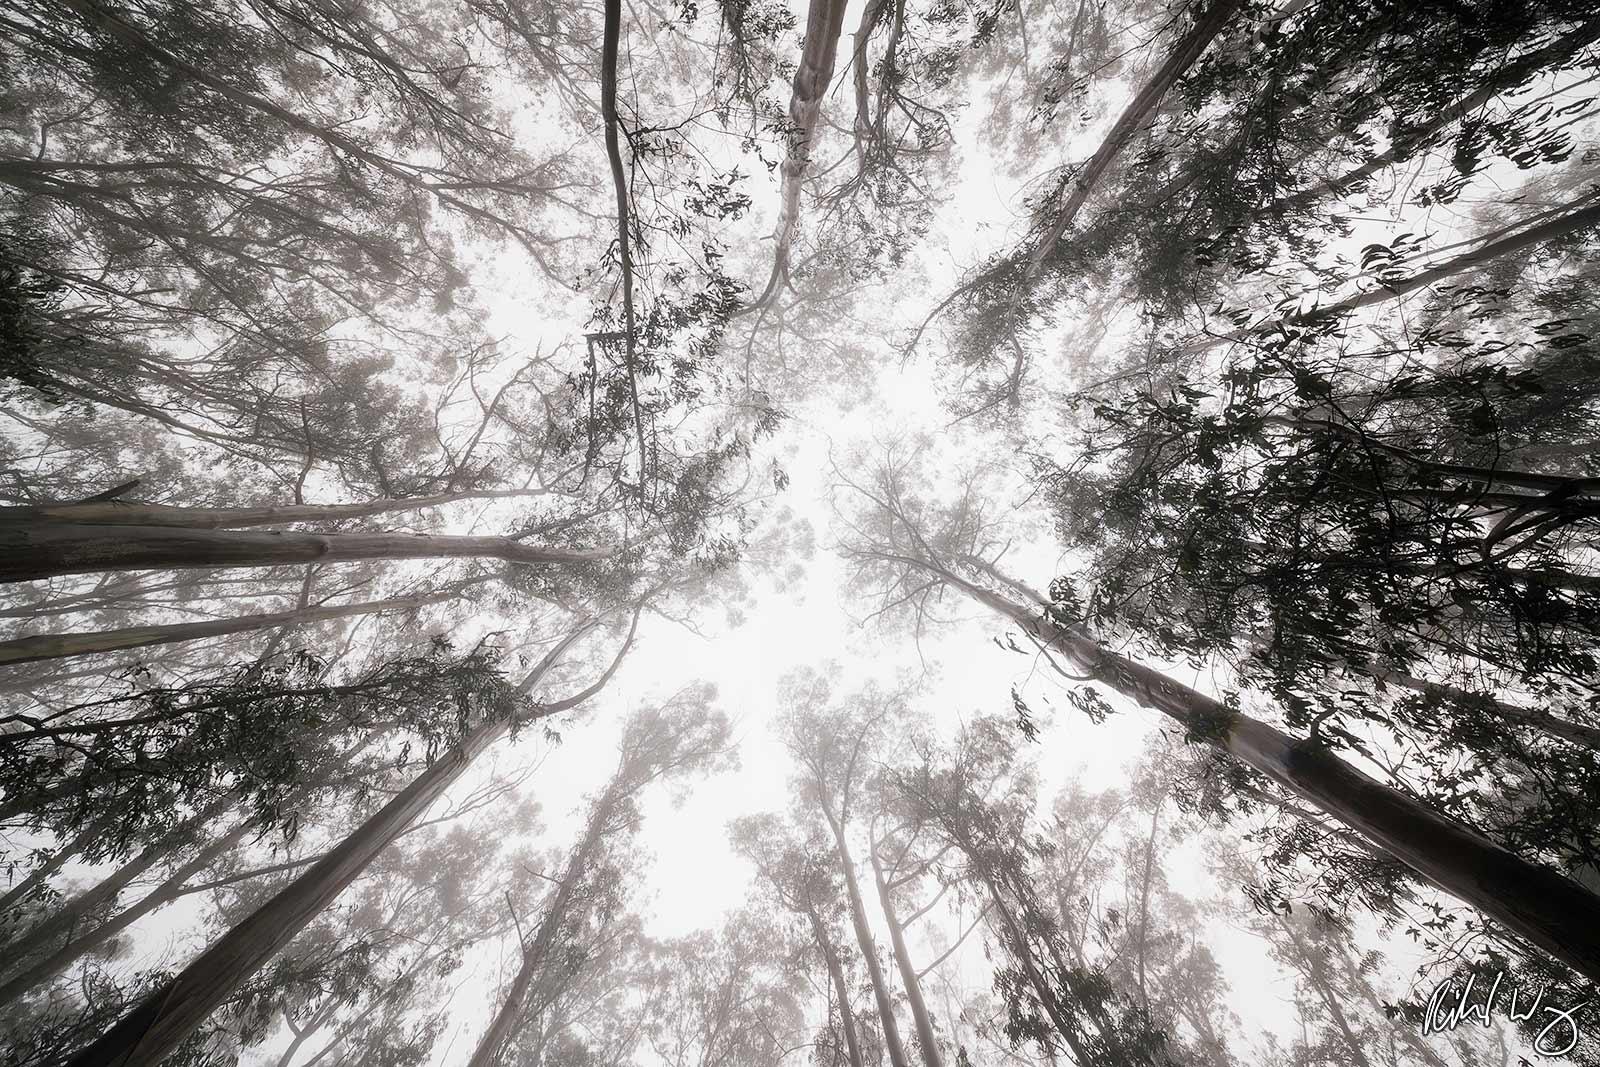 Foggy Eucalyptus Forest Tree Canopy, San Francisco, California As I walked through this quiet forest raining with fog precipitation...